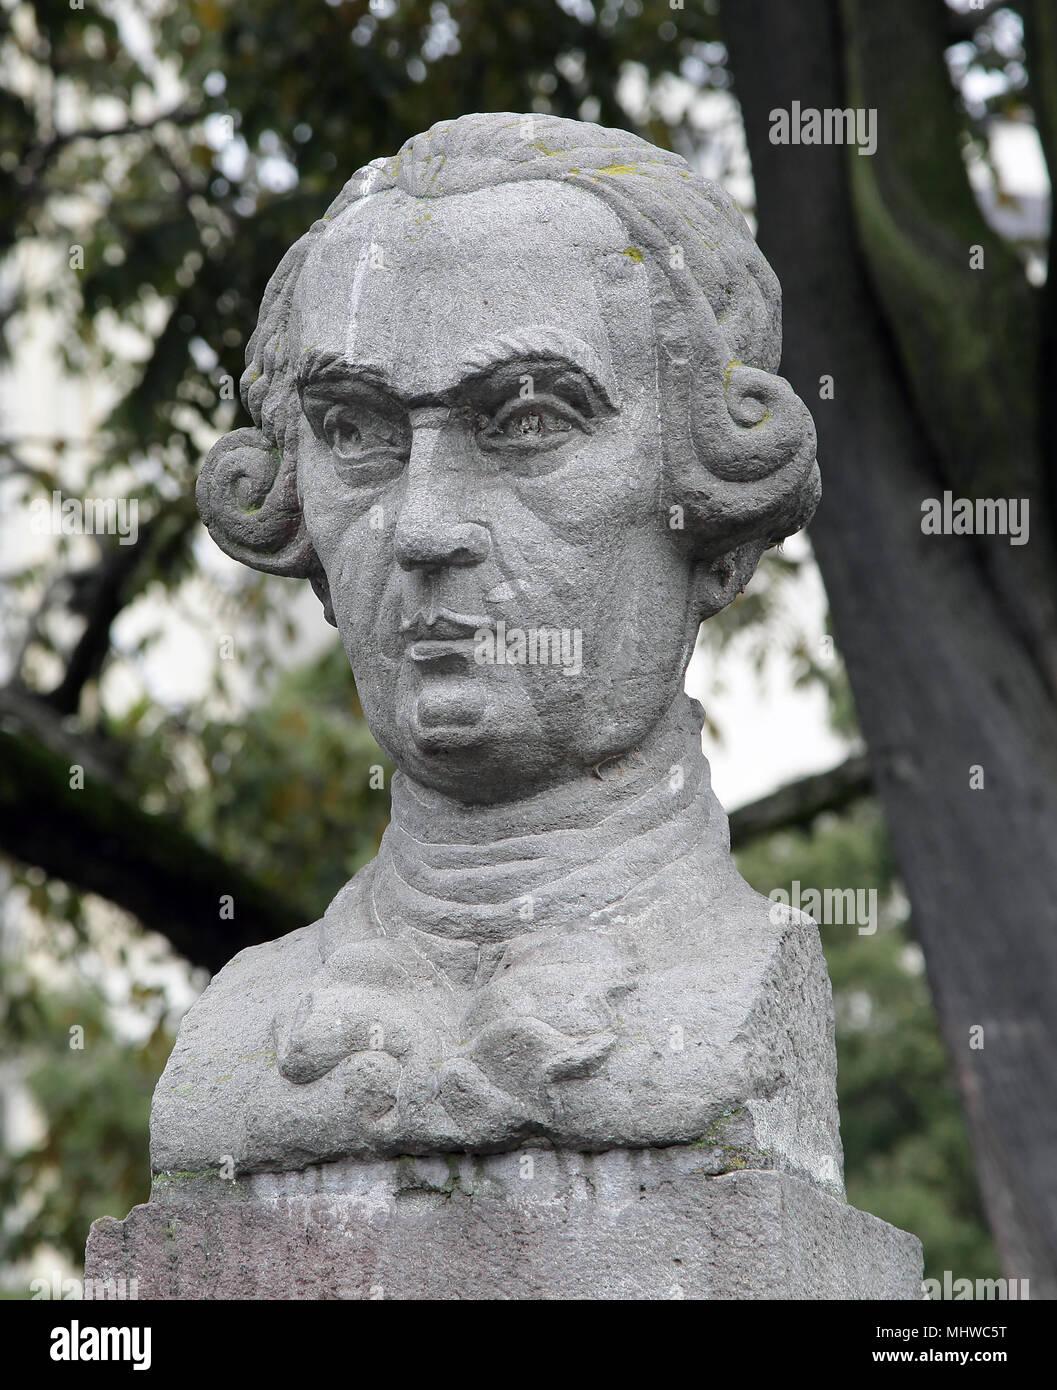 Antonio de Ulloa in Parque Alameda Quito Ecuador - Stock Image